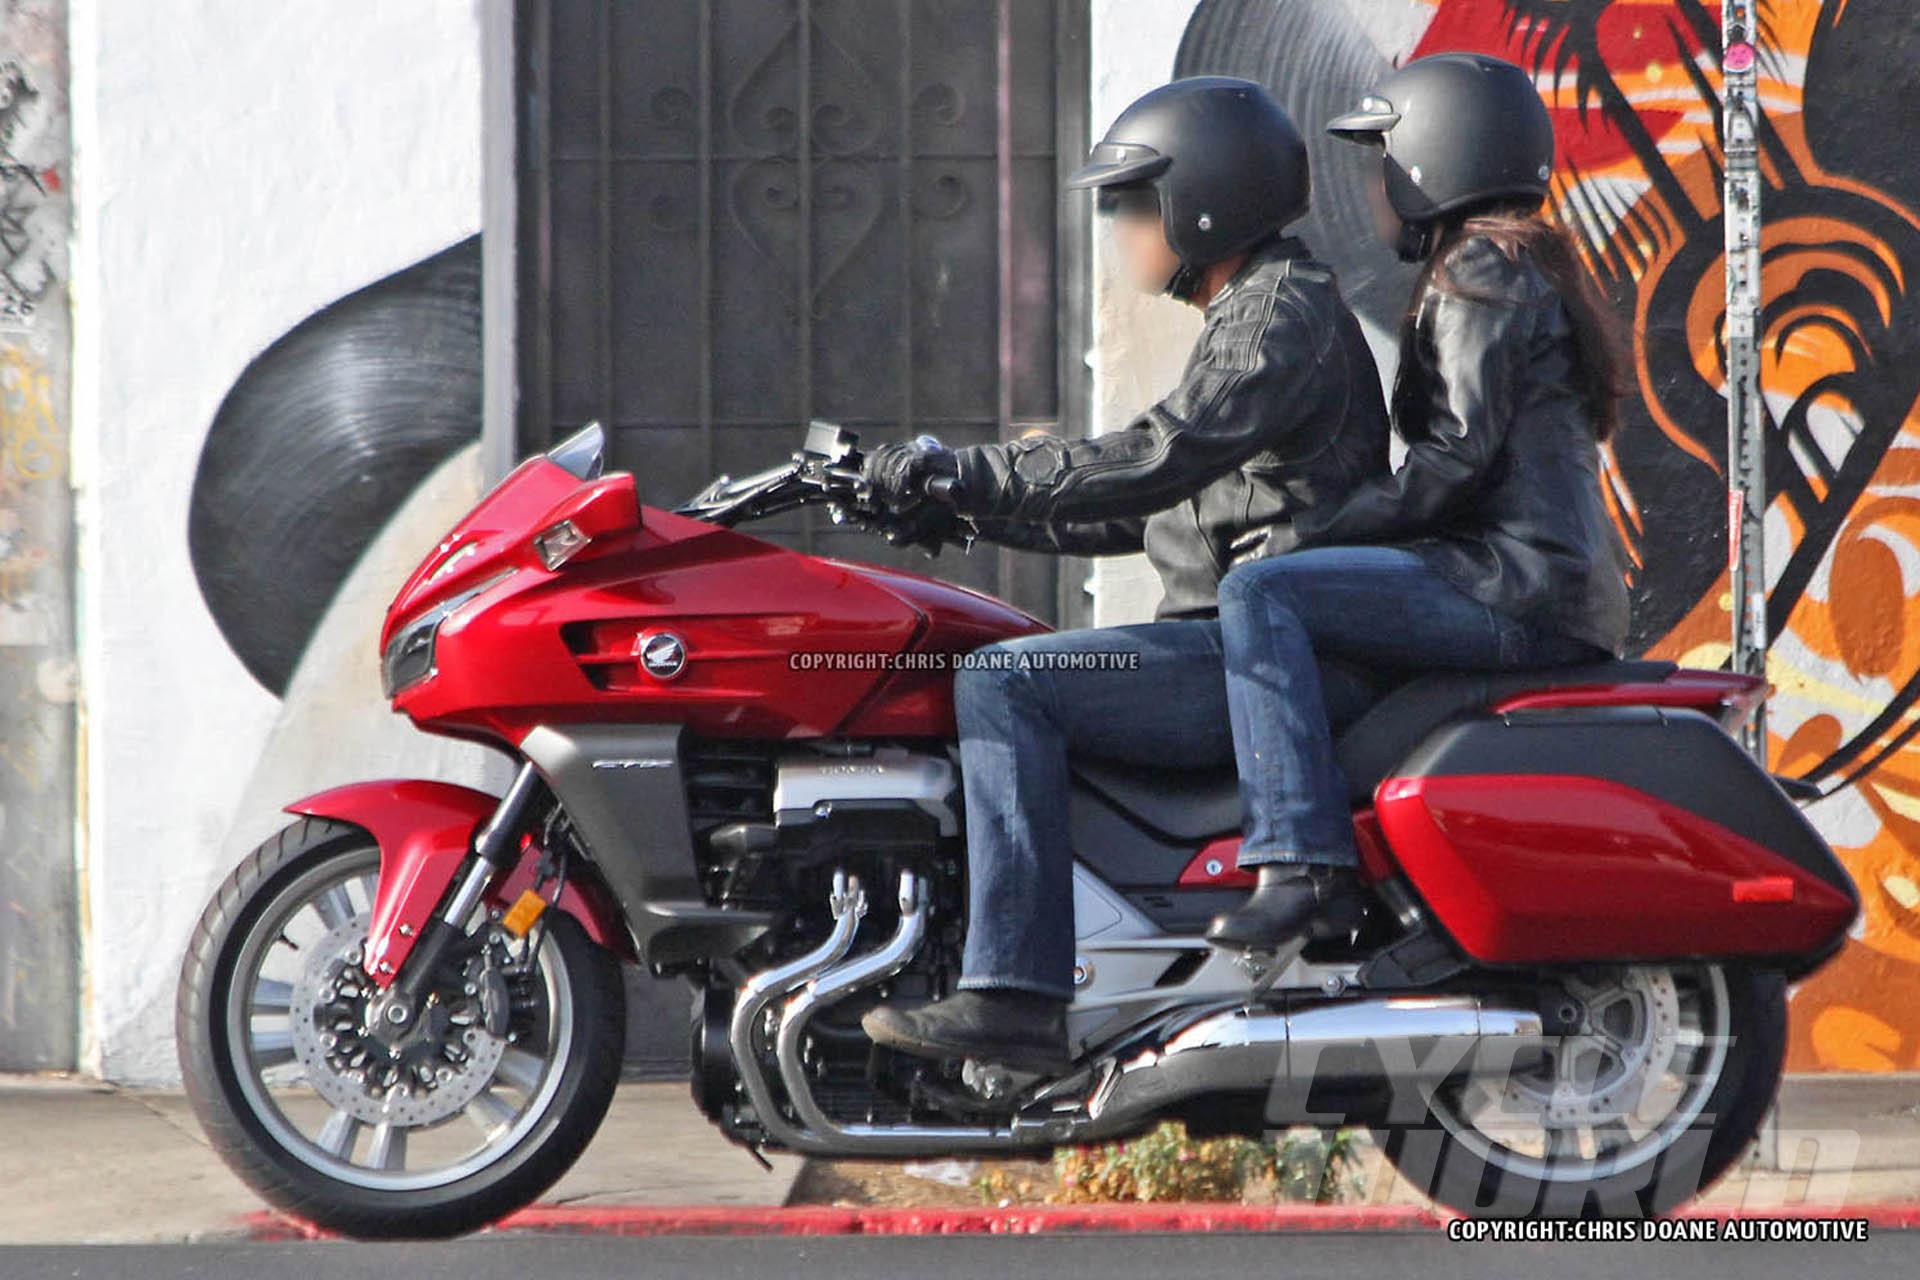 Honda Pioneer Reviews >> Honda CTX1300 Spied, Shows Massive F6B DNA - autoevolution